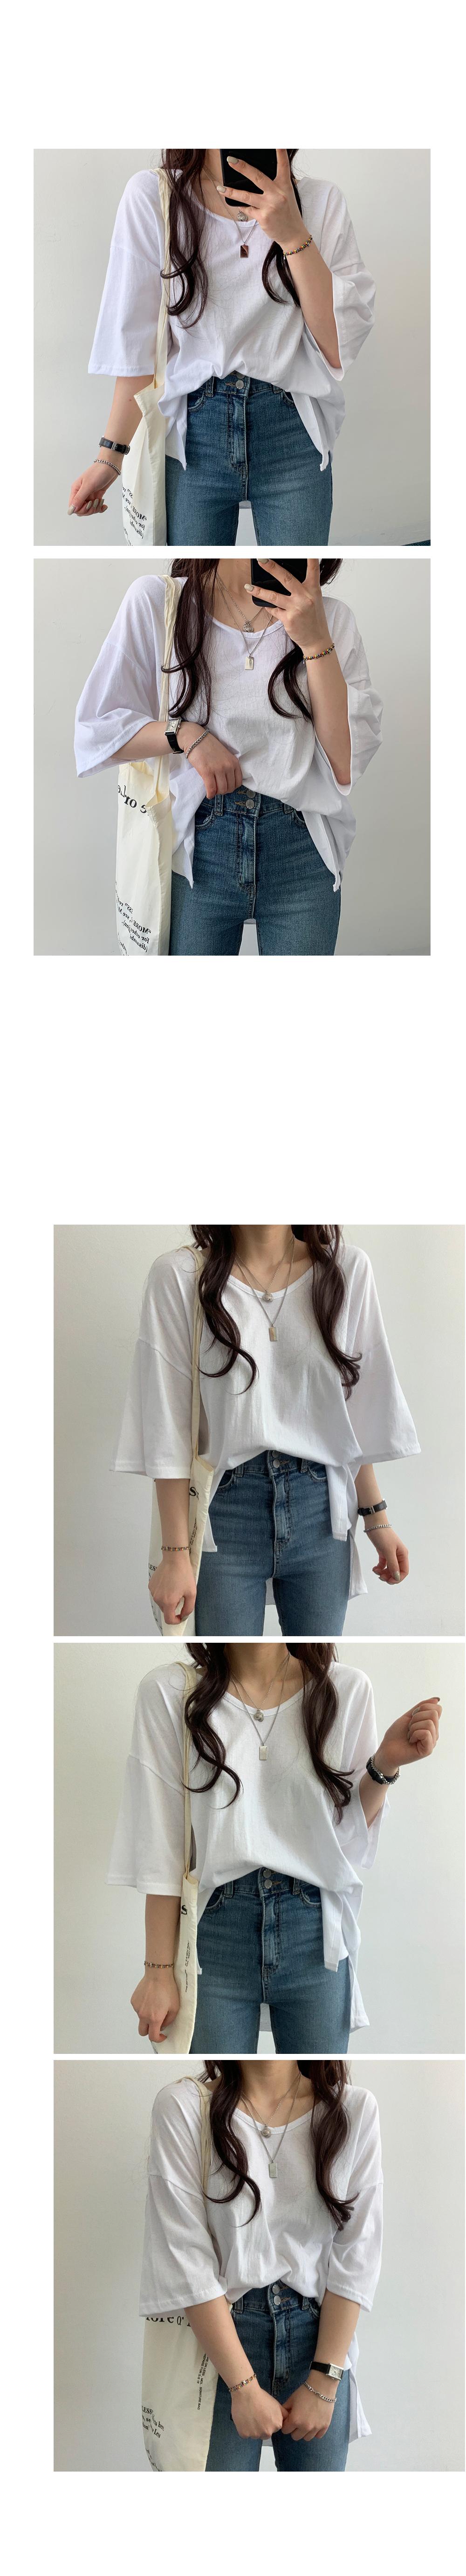 T-shirt short sleeve tee